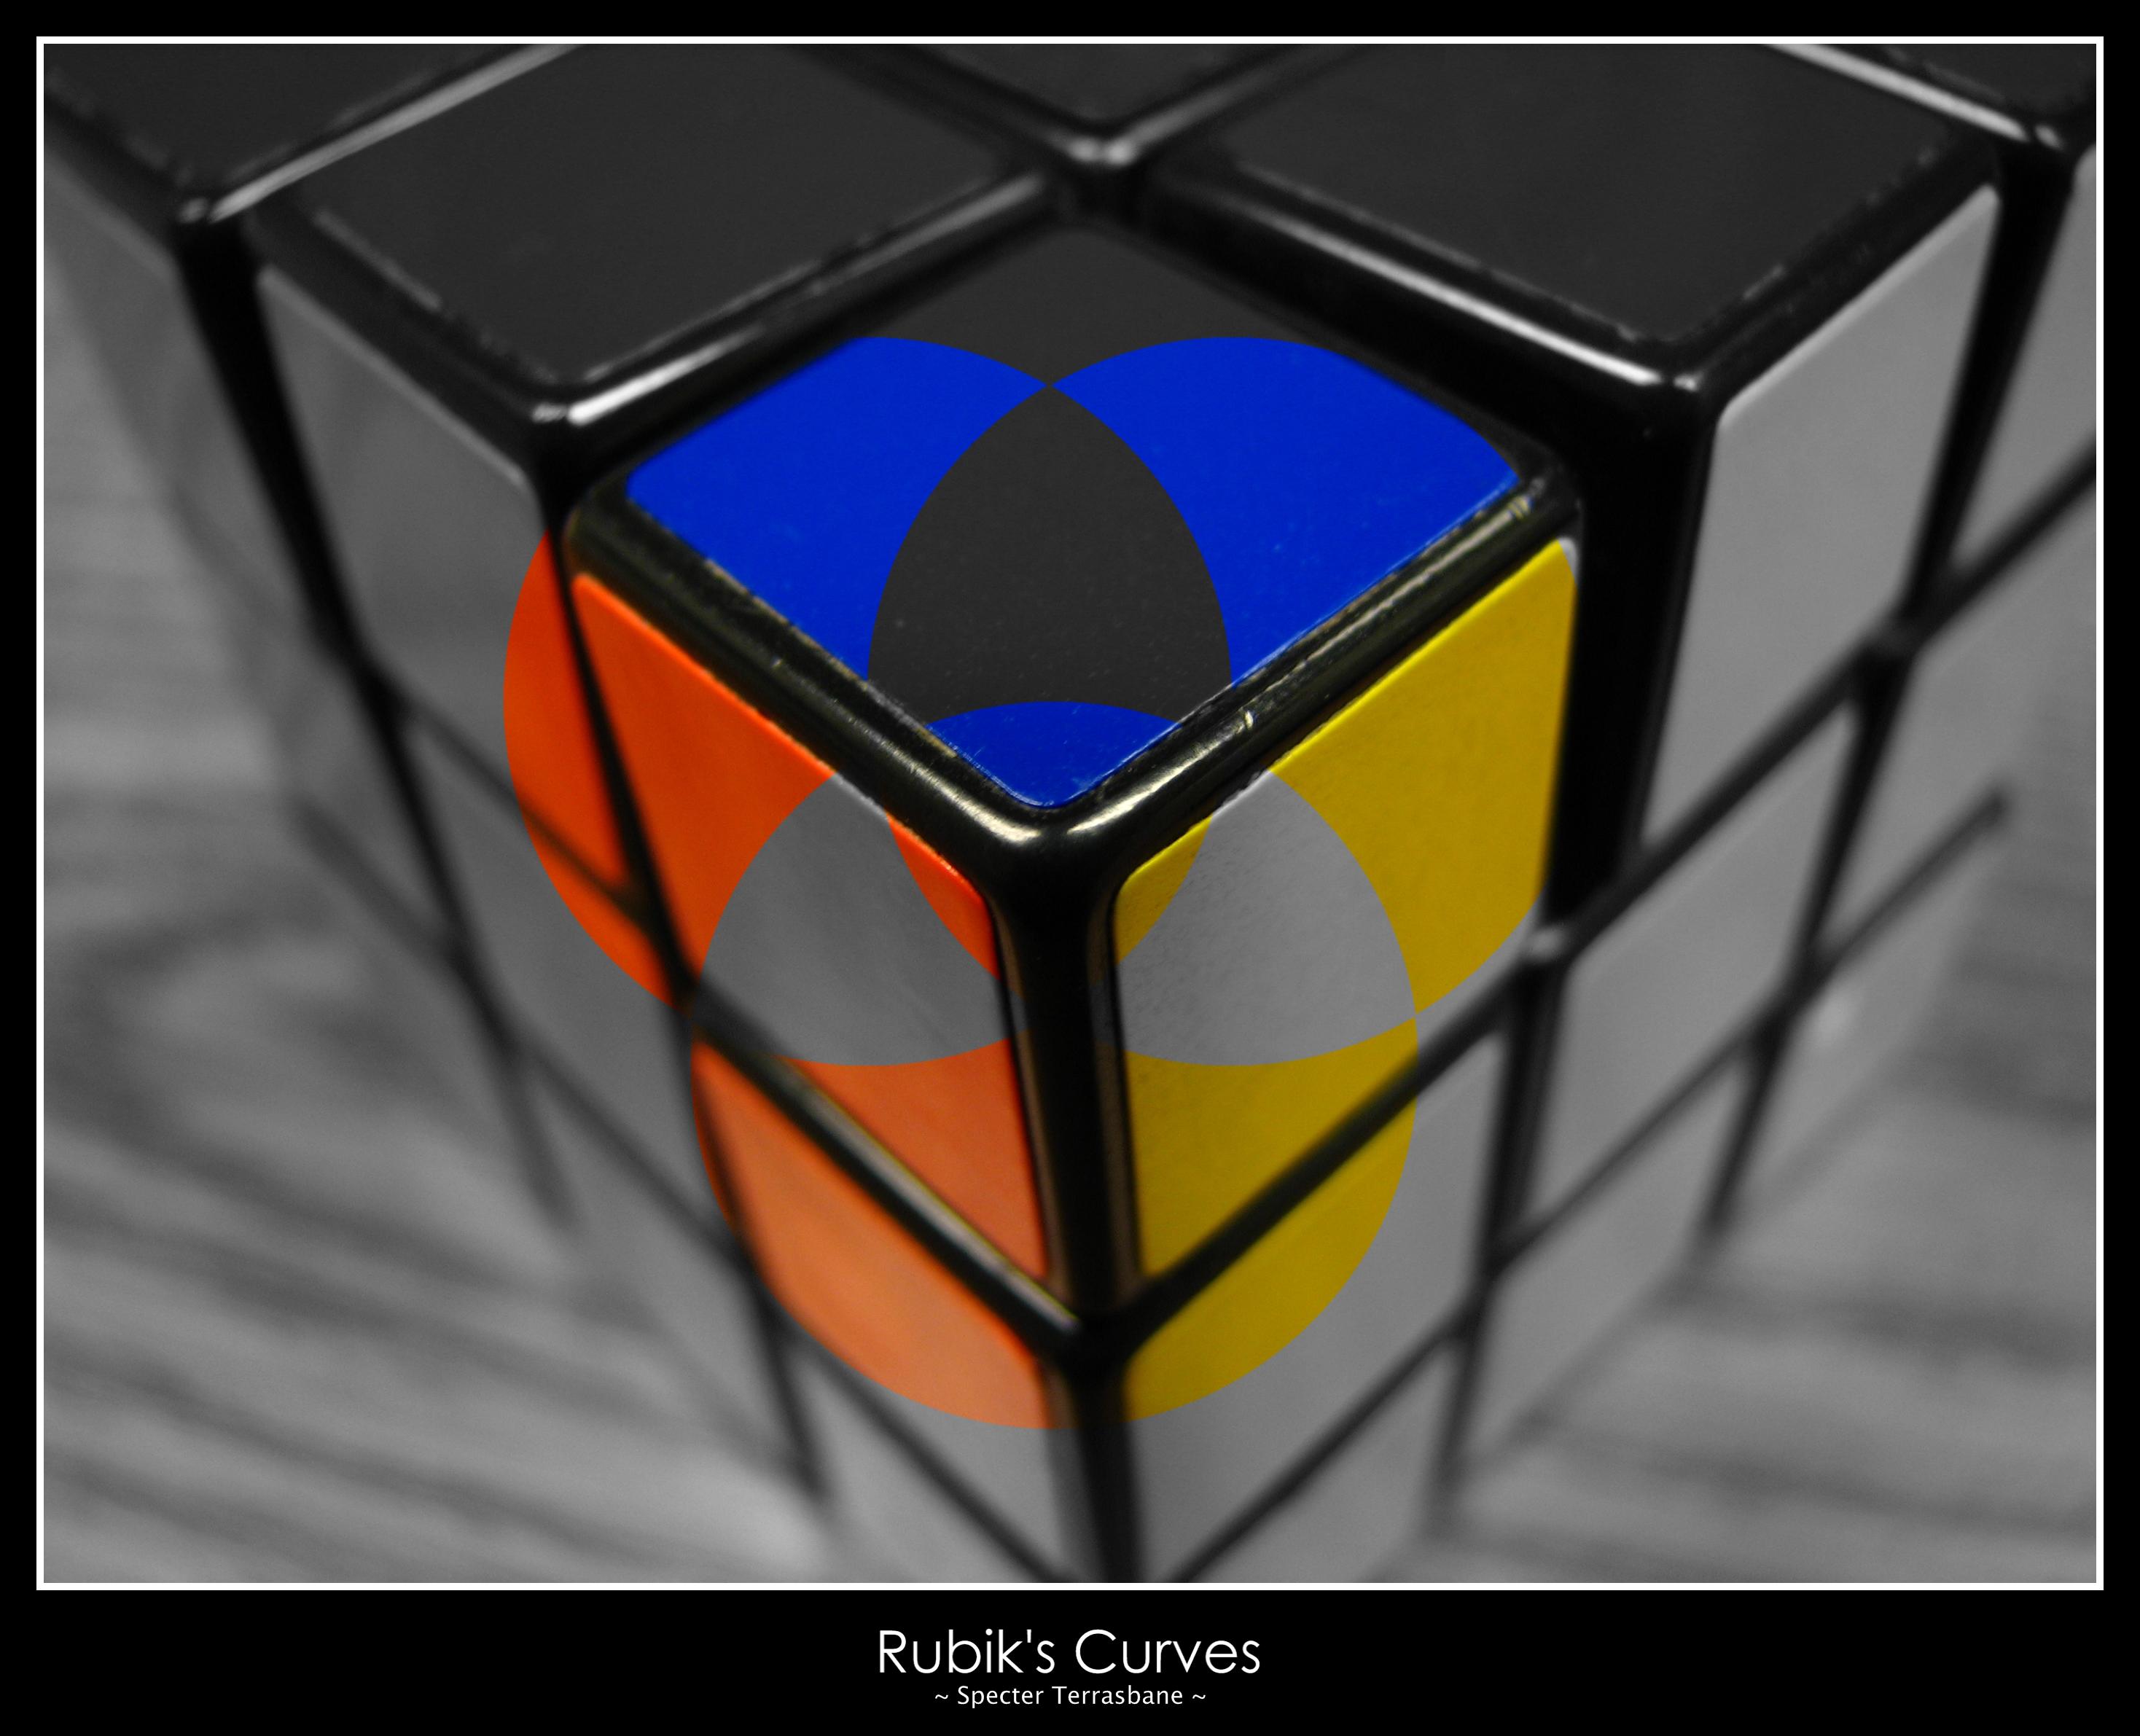 Cube Rubiks Wallpaper 2936x2382 Cube Rubiks Cube 2936x2382